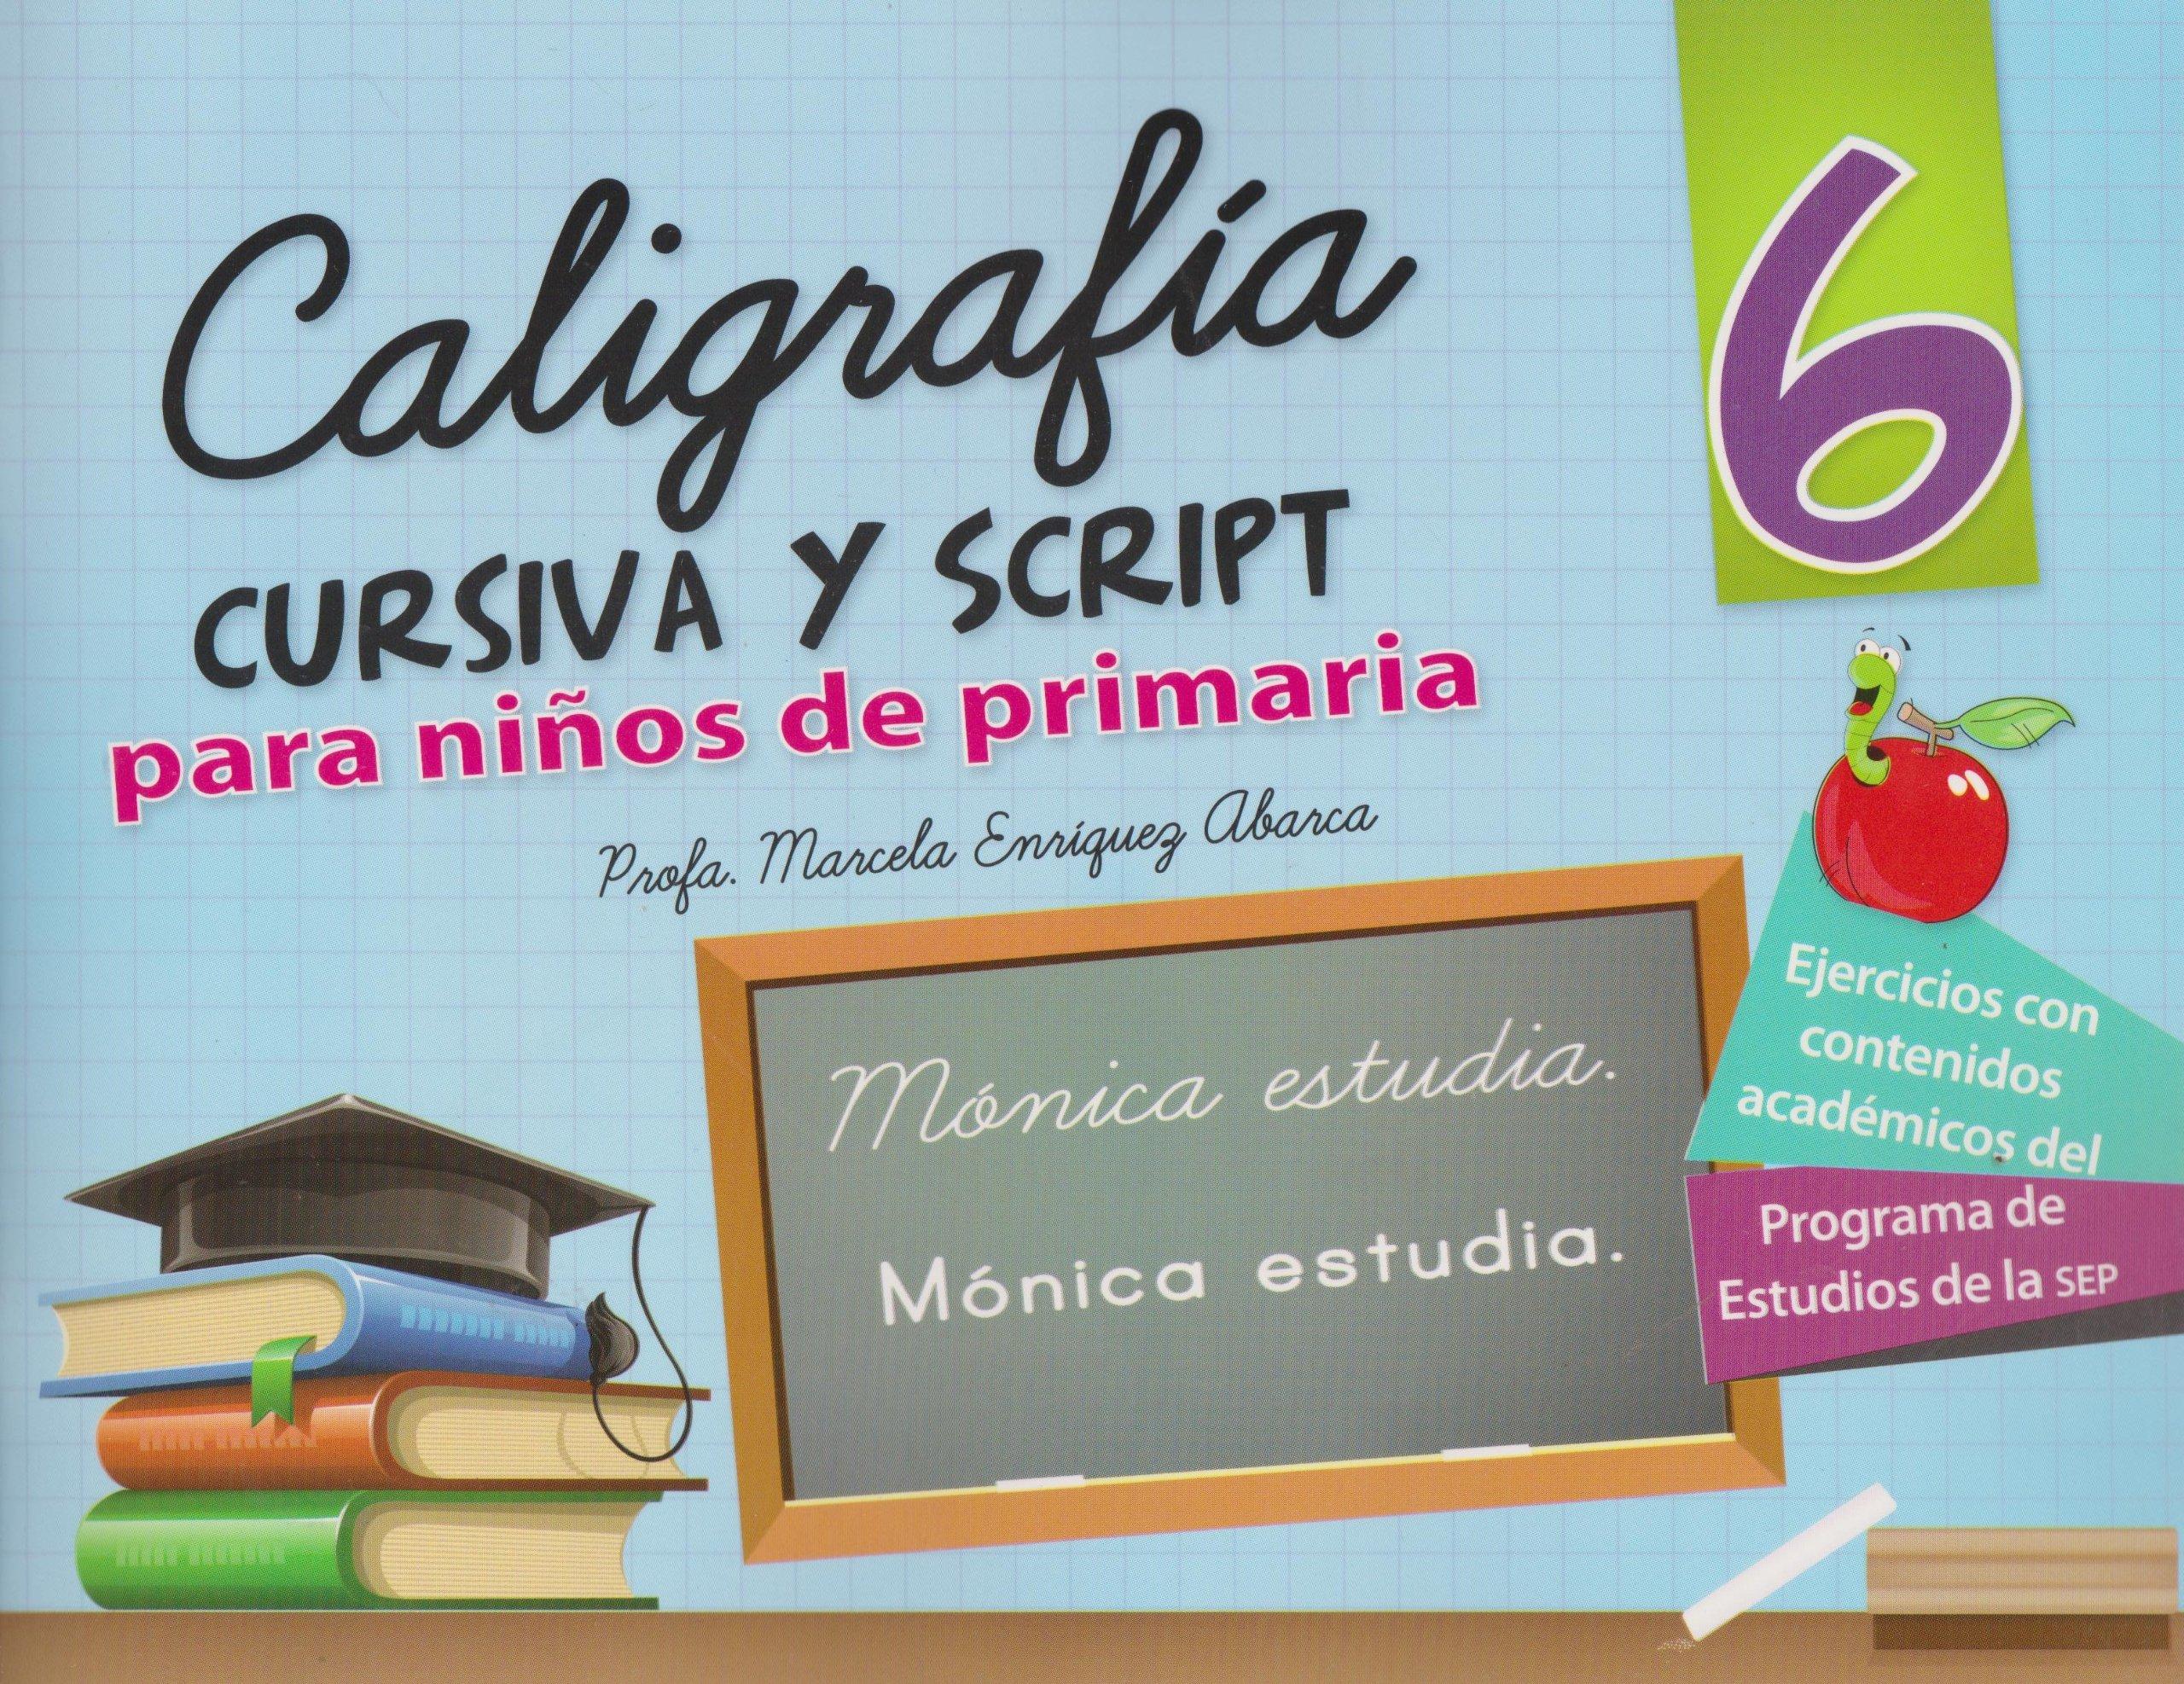 Caligrafia cursiva y script 6 para ninos de primaria (Spanish Edition): Marcela Profa. Enriquez Abarca: 9786071412164: Amazon.com: Books